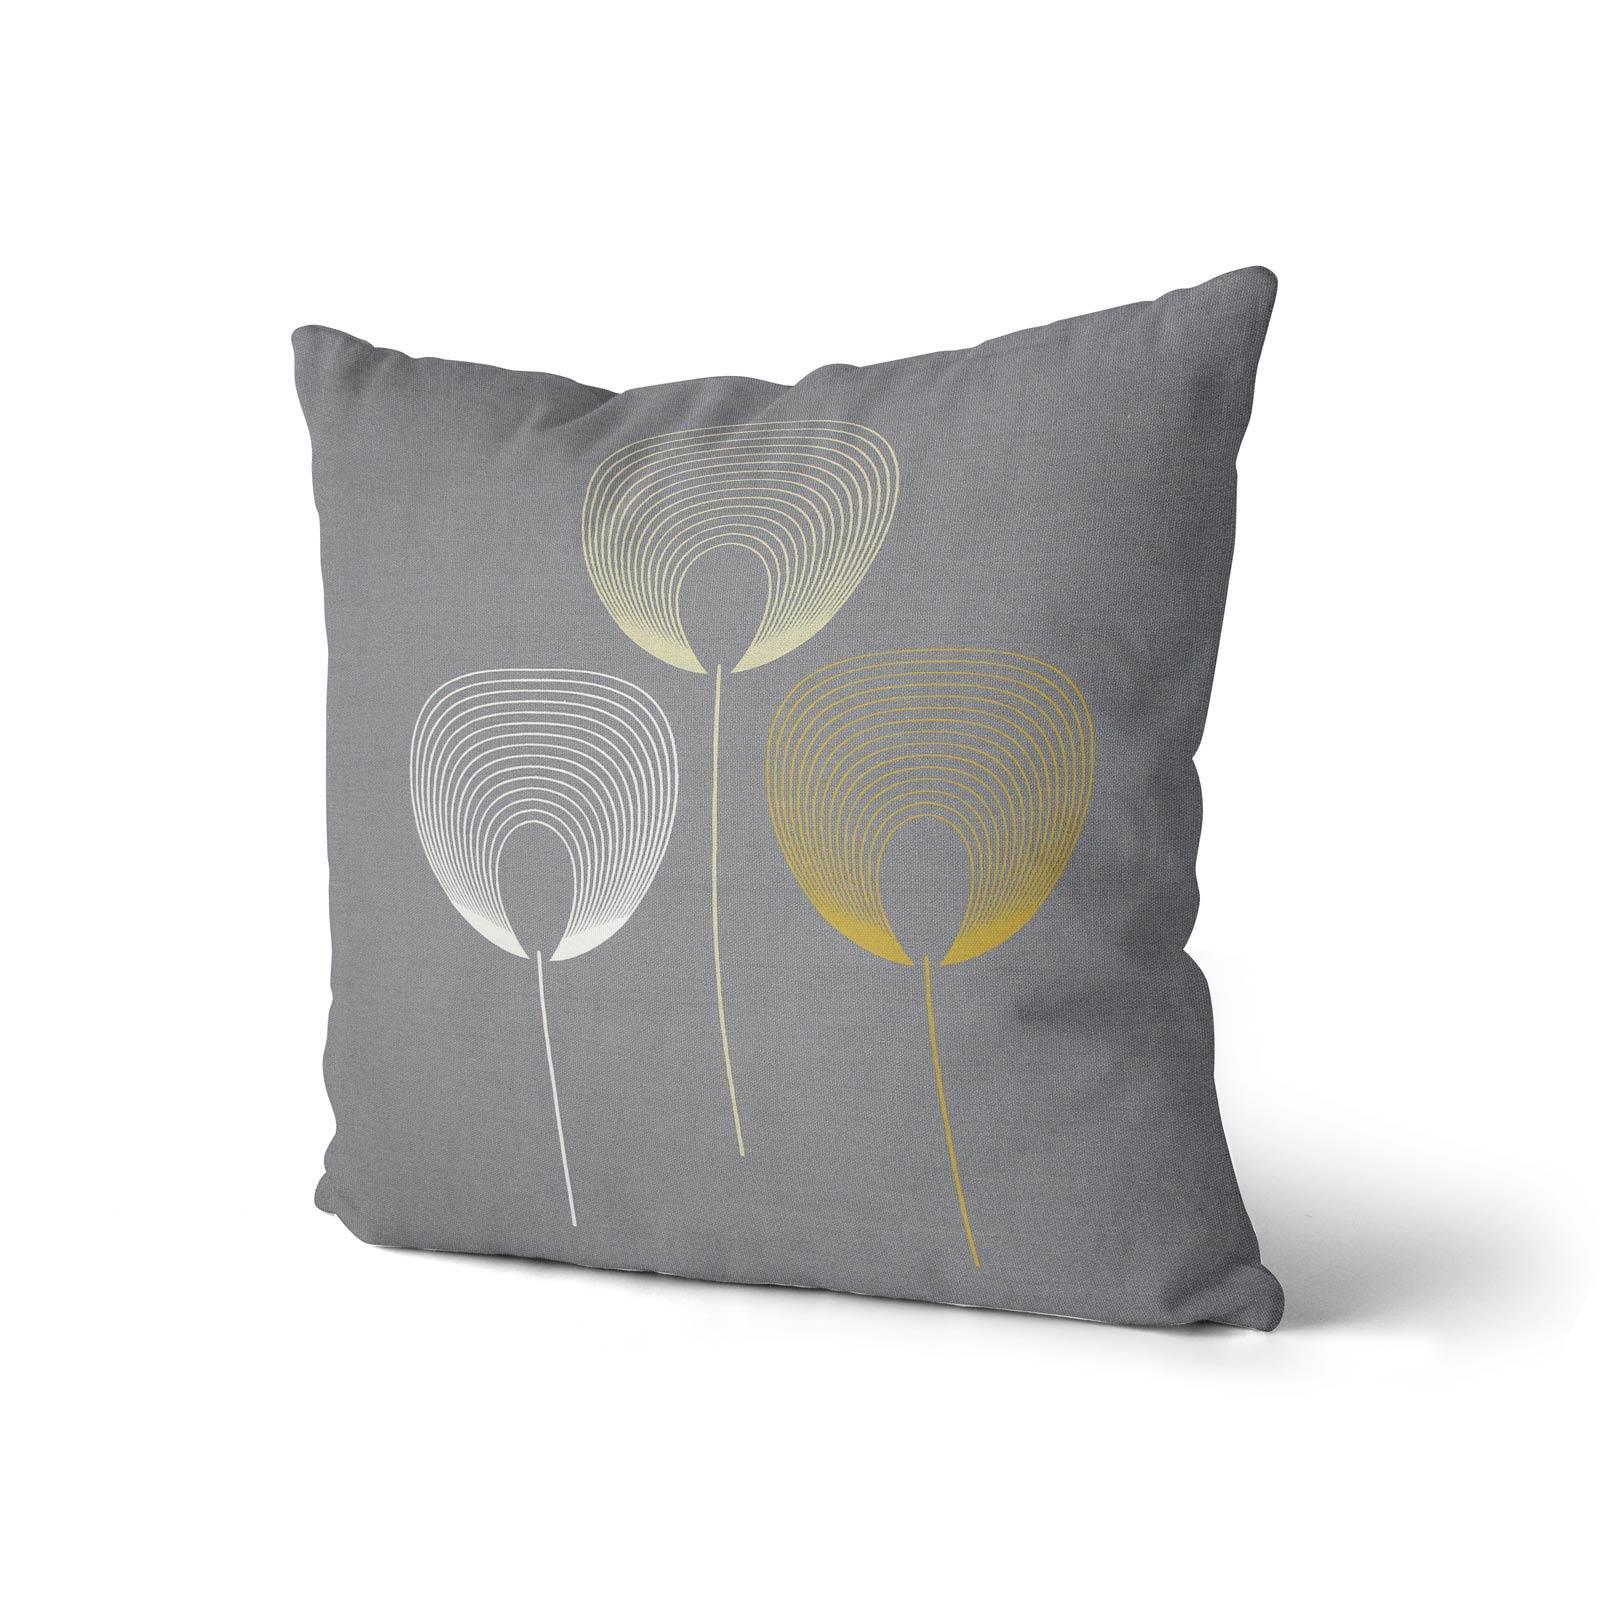 Geometrica-Cushion-Covers-Cojines-De-Impresion-Floral-Gris-Beige-Ocre-cubre-17-034-X-17-034 miniatura 17